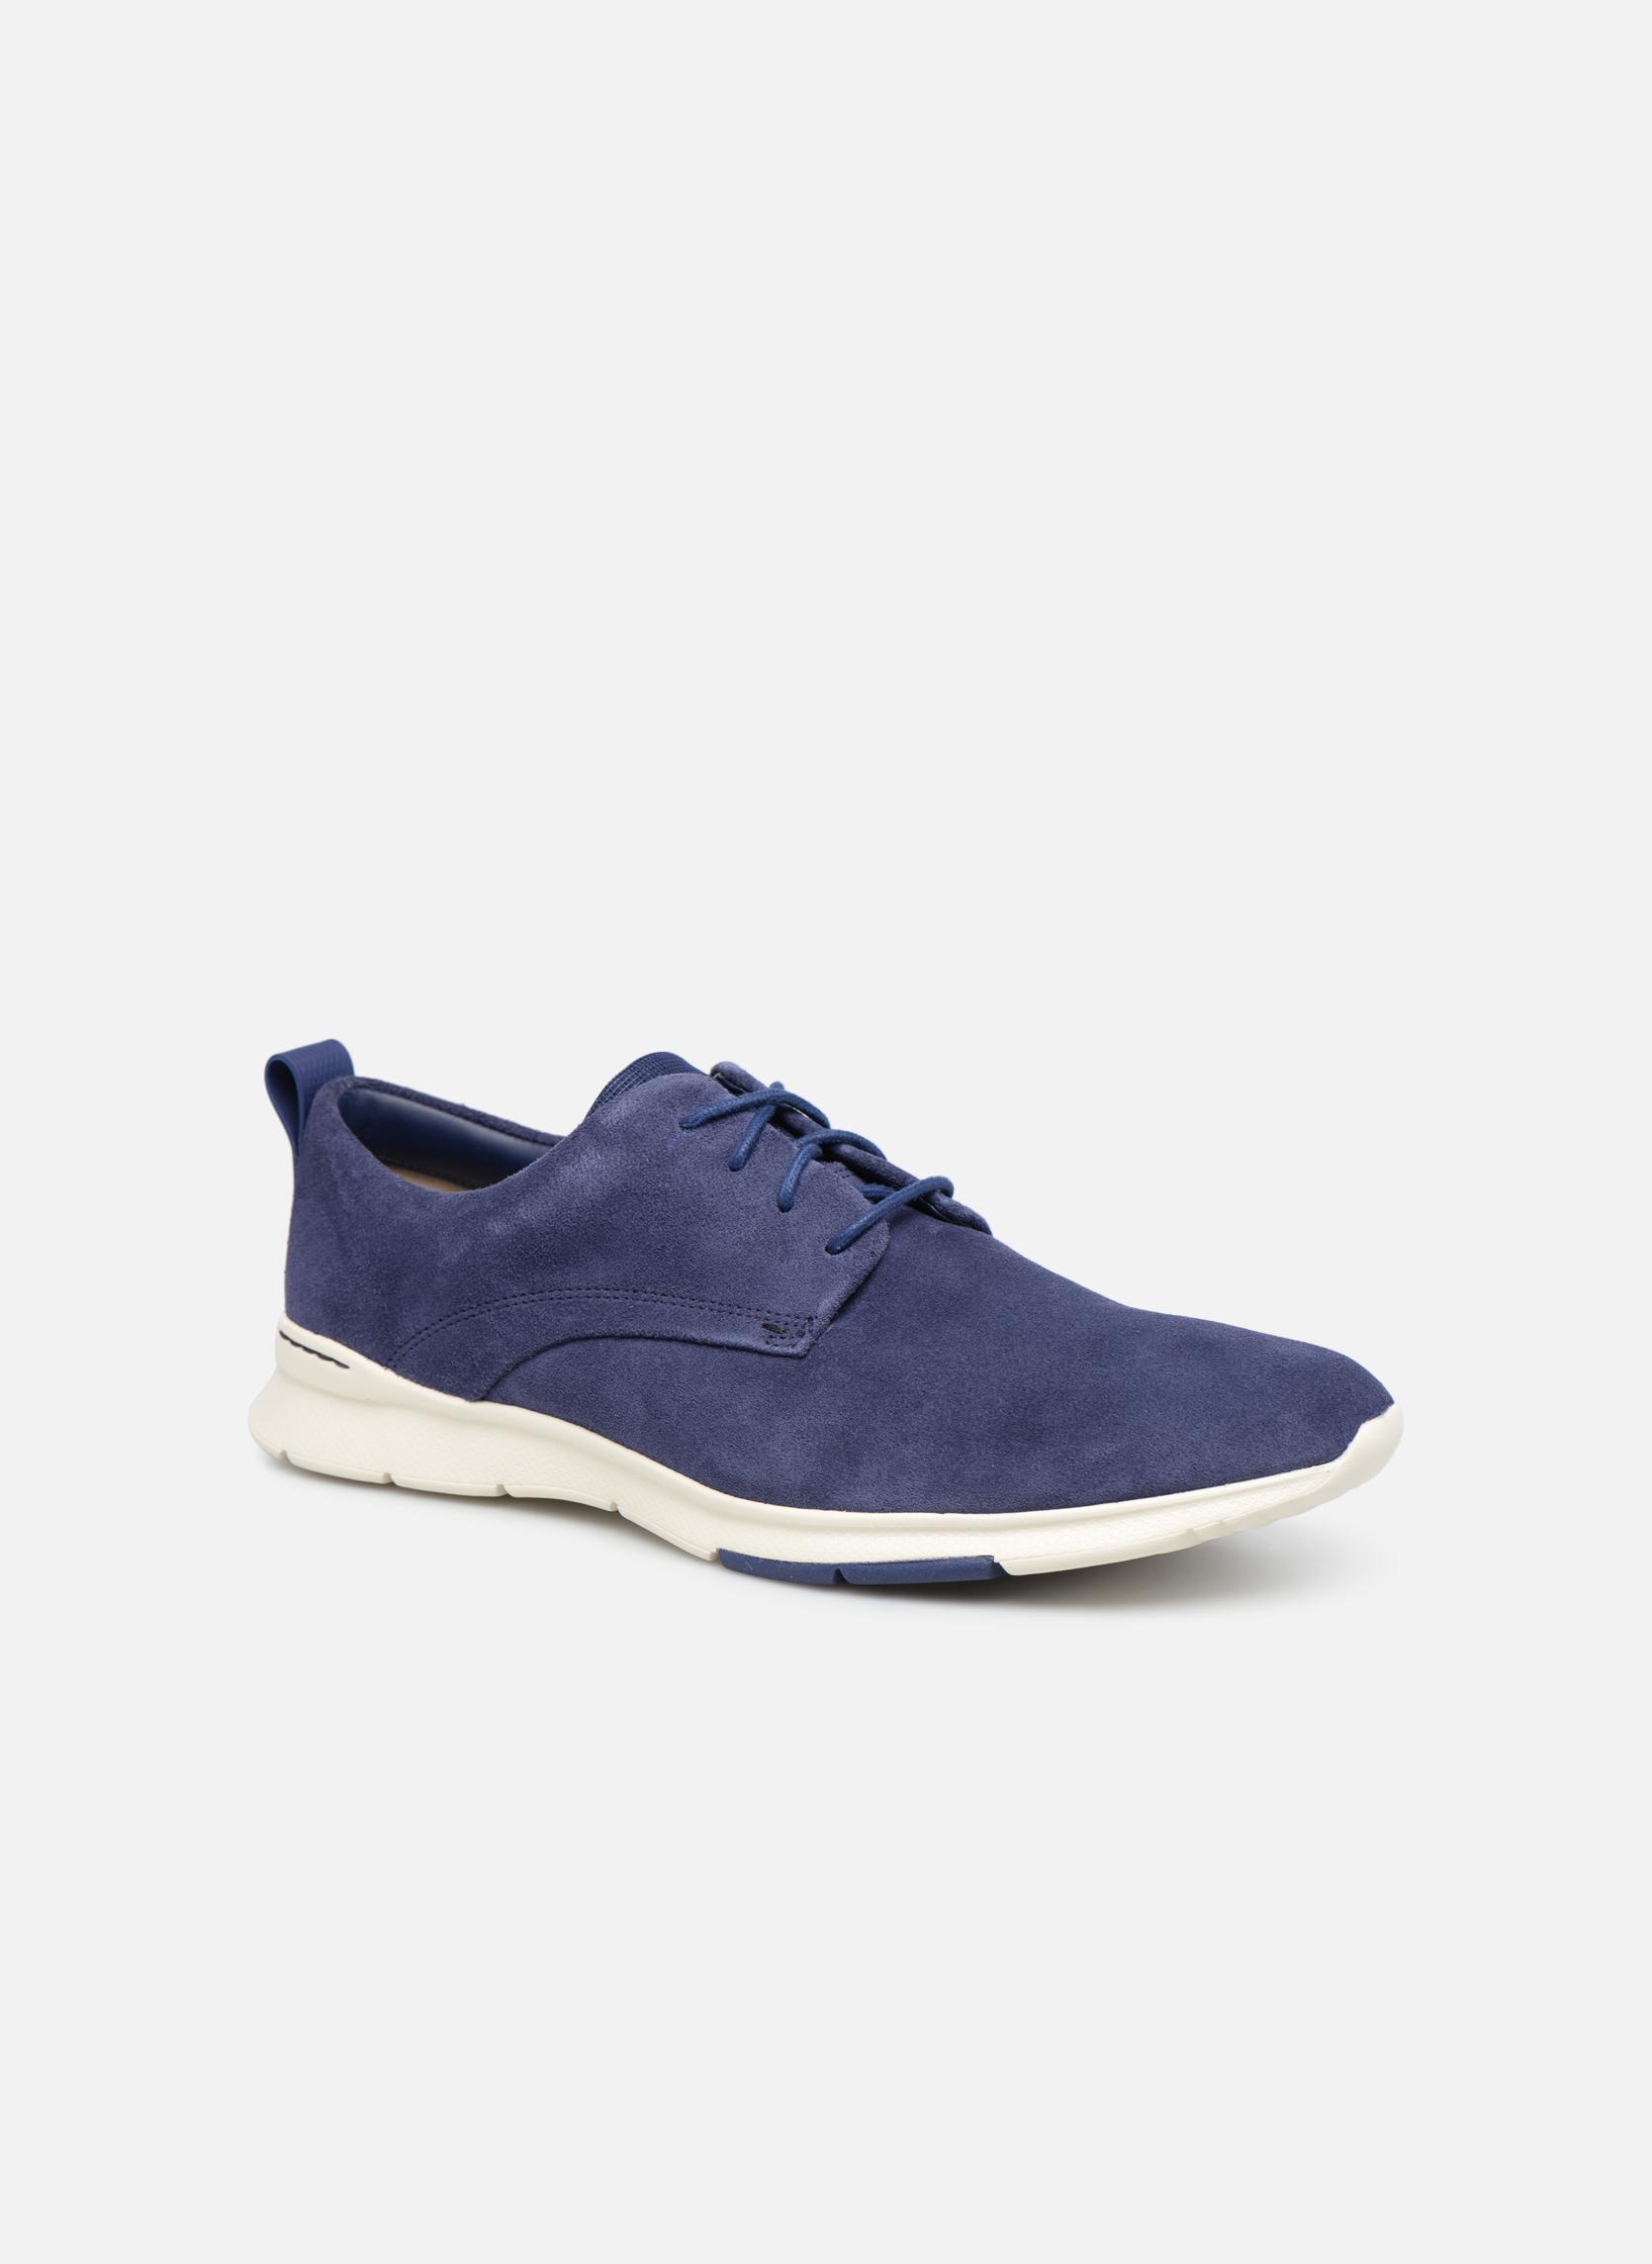 Tynamo Walk Blue Suede